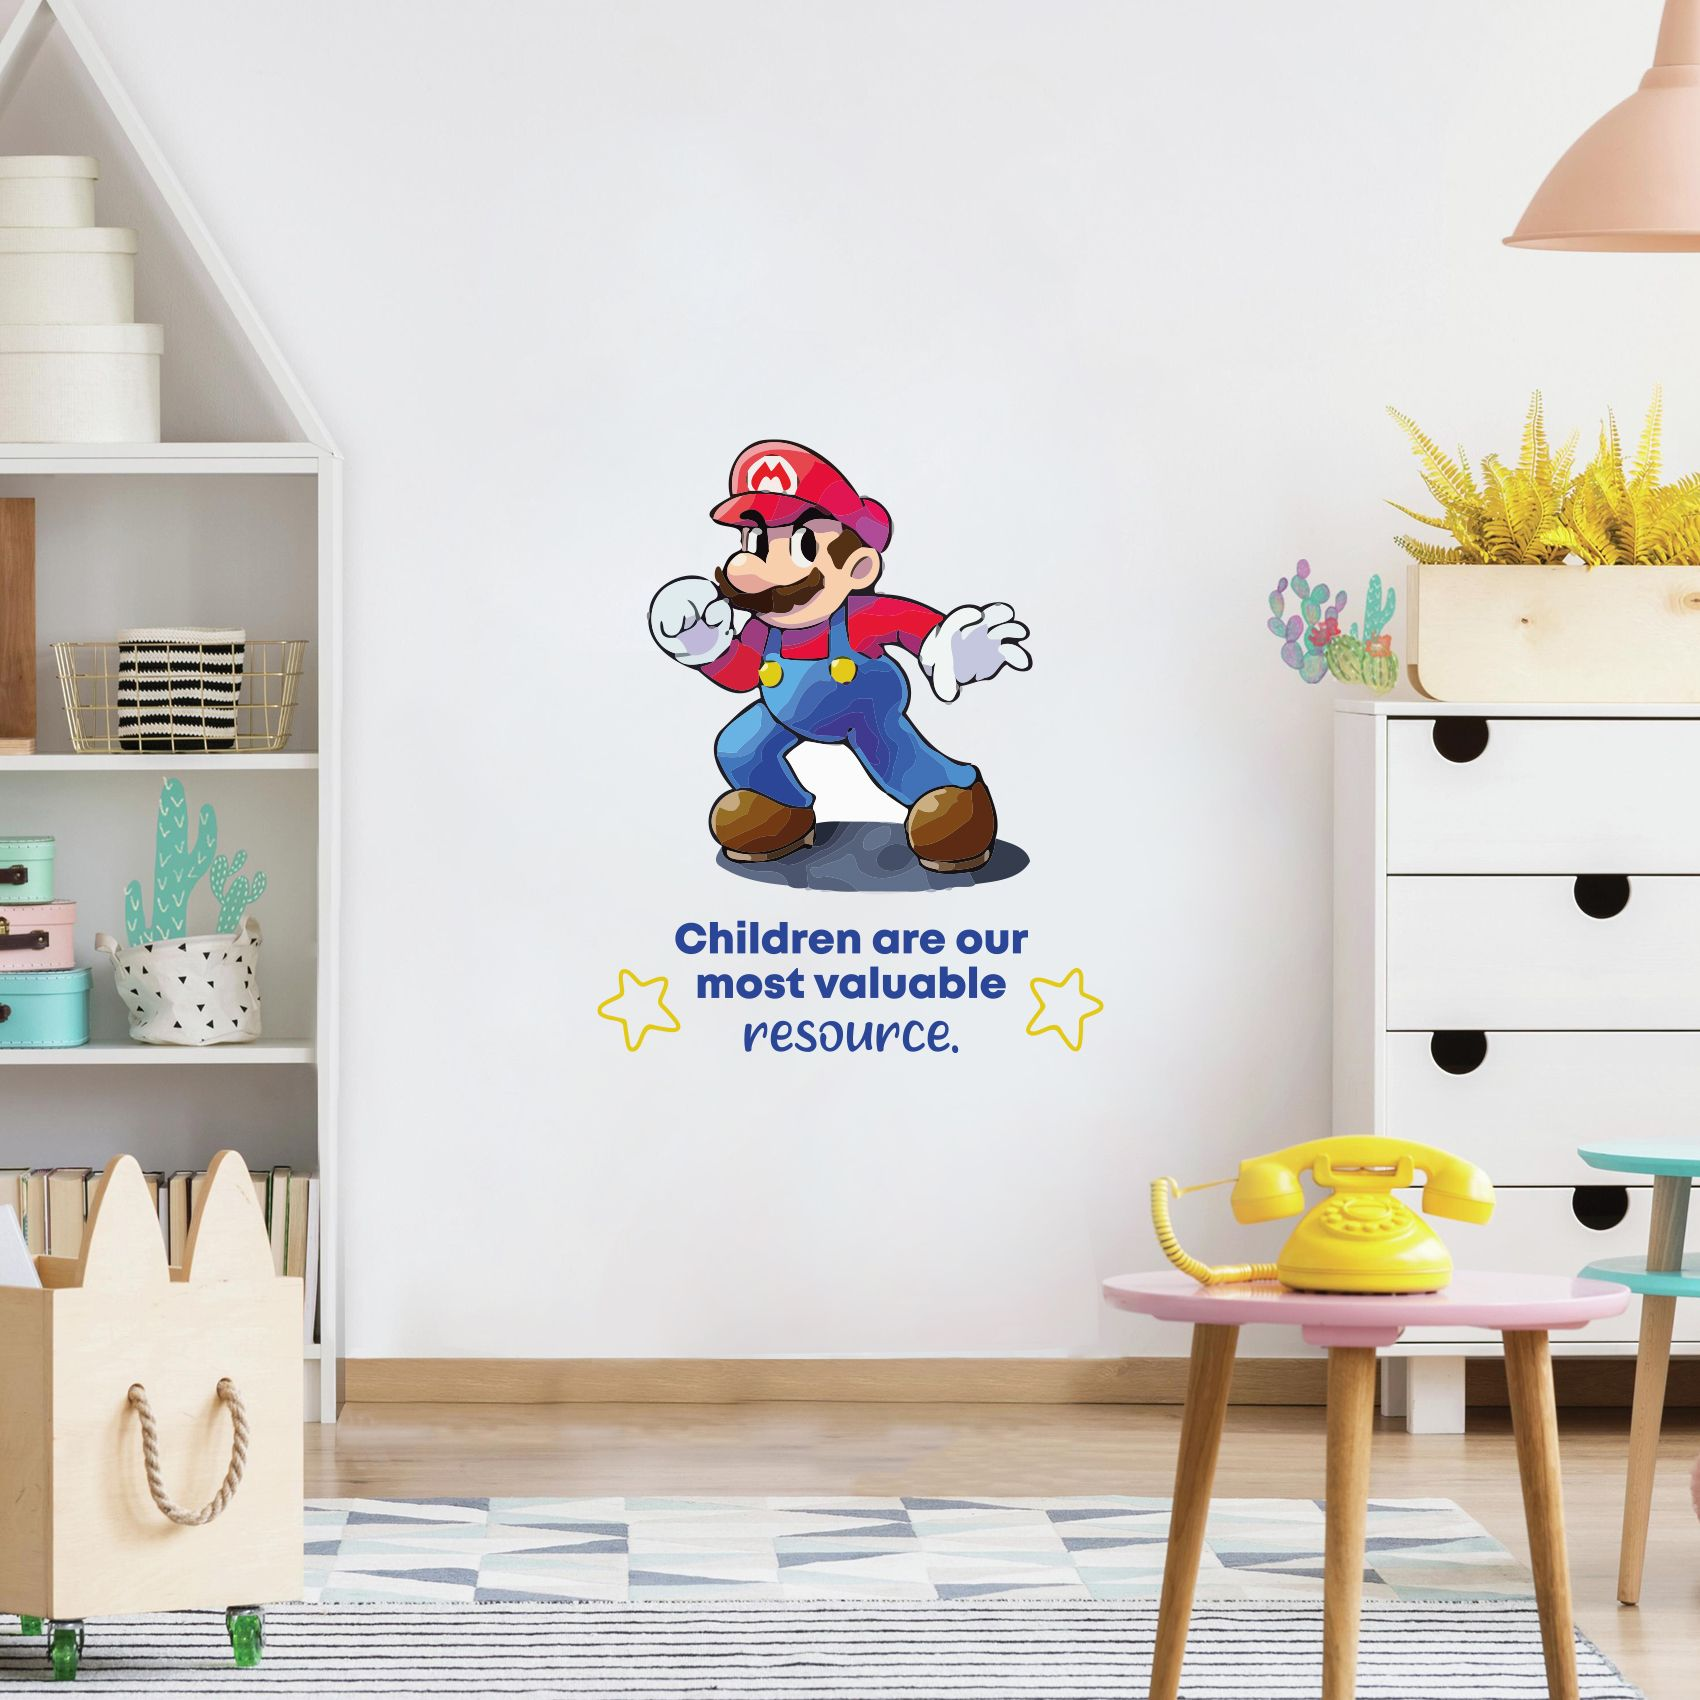 Valuable Super Mario Life Quote Cartoon Quotes Decors Wall Sticker Art Design Decal For Girls Boys Kids Room Bedroom Nursery Kindergarten Home Decor Stickers Wall Art Vinyl Decoration 10x8 Inch Walmart Com